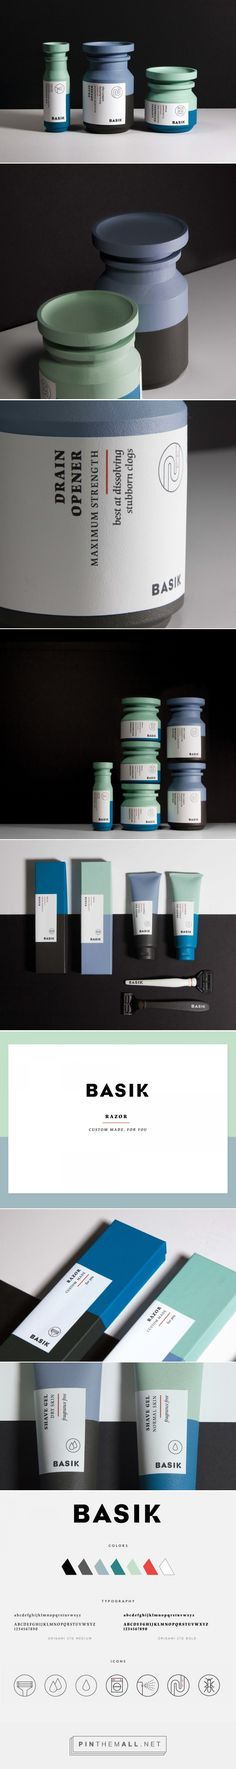 basik, minimal gender-neutral packaging for hygiene products by HELLSTEN